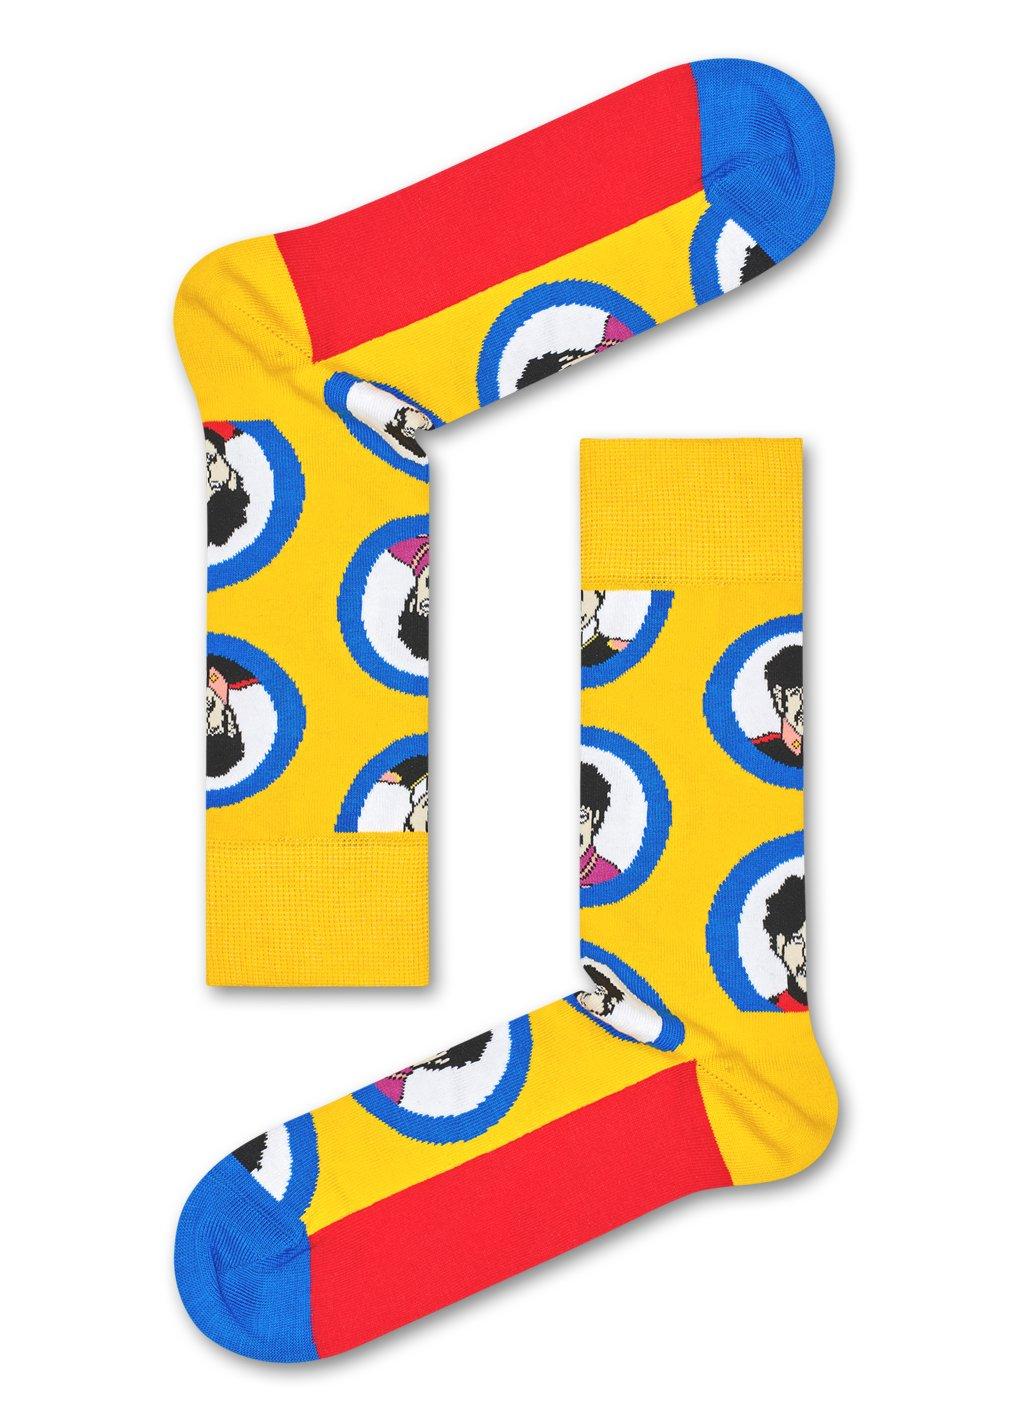 Žluté ponožky Happy Socks s kapelou x The Beatles x The Beatles M-L (41-46)